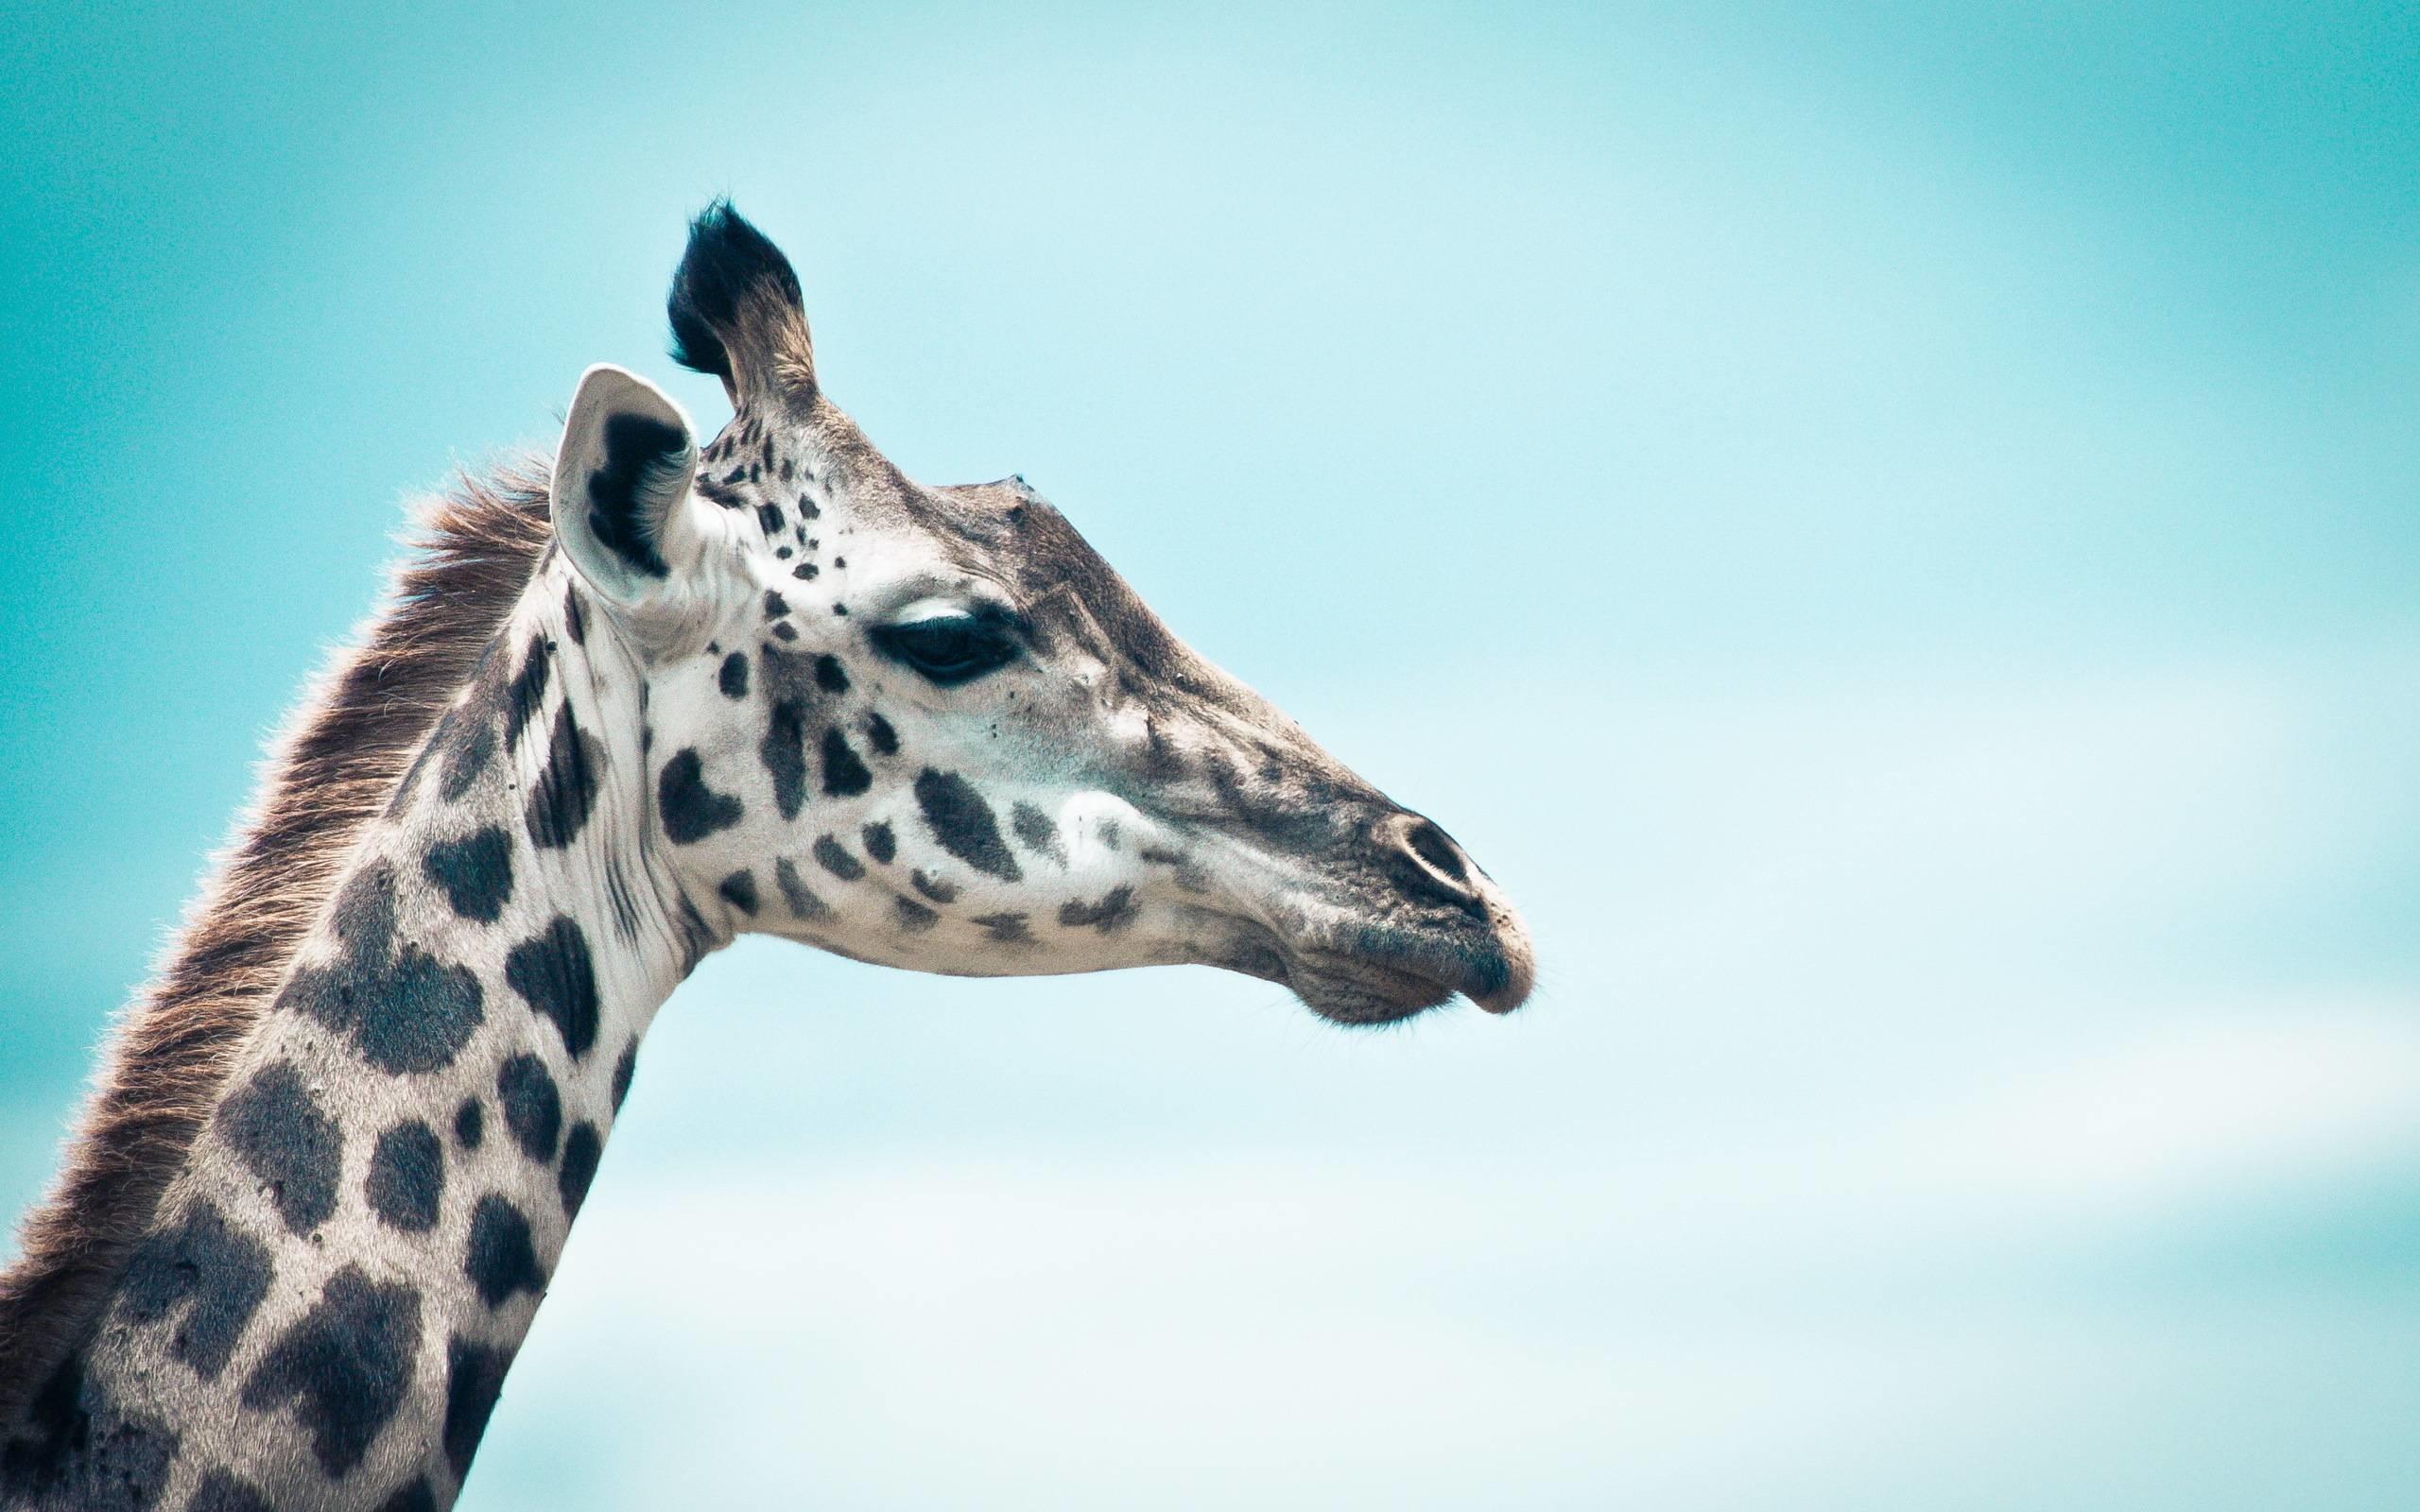 Amazing Wallpaper Colorful Giraffe - 657875-giraffes-wallpapers-2560x1600-xiaomi  Trends_192374 .jpg